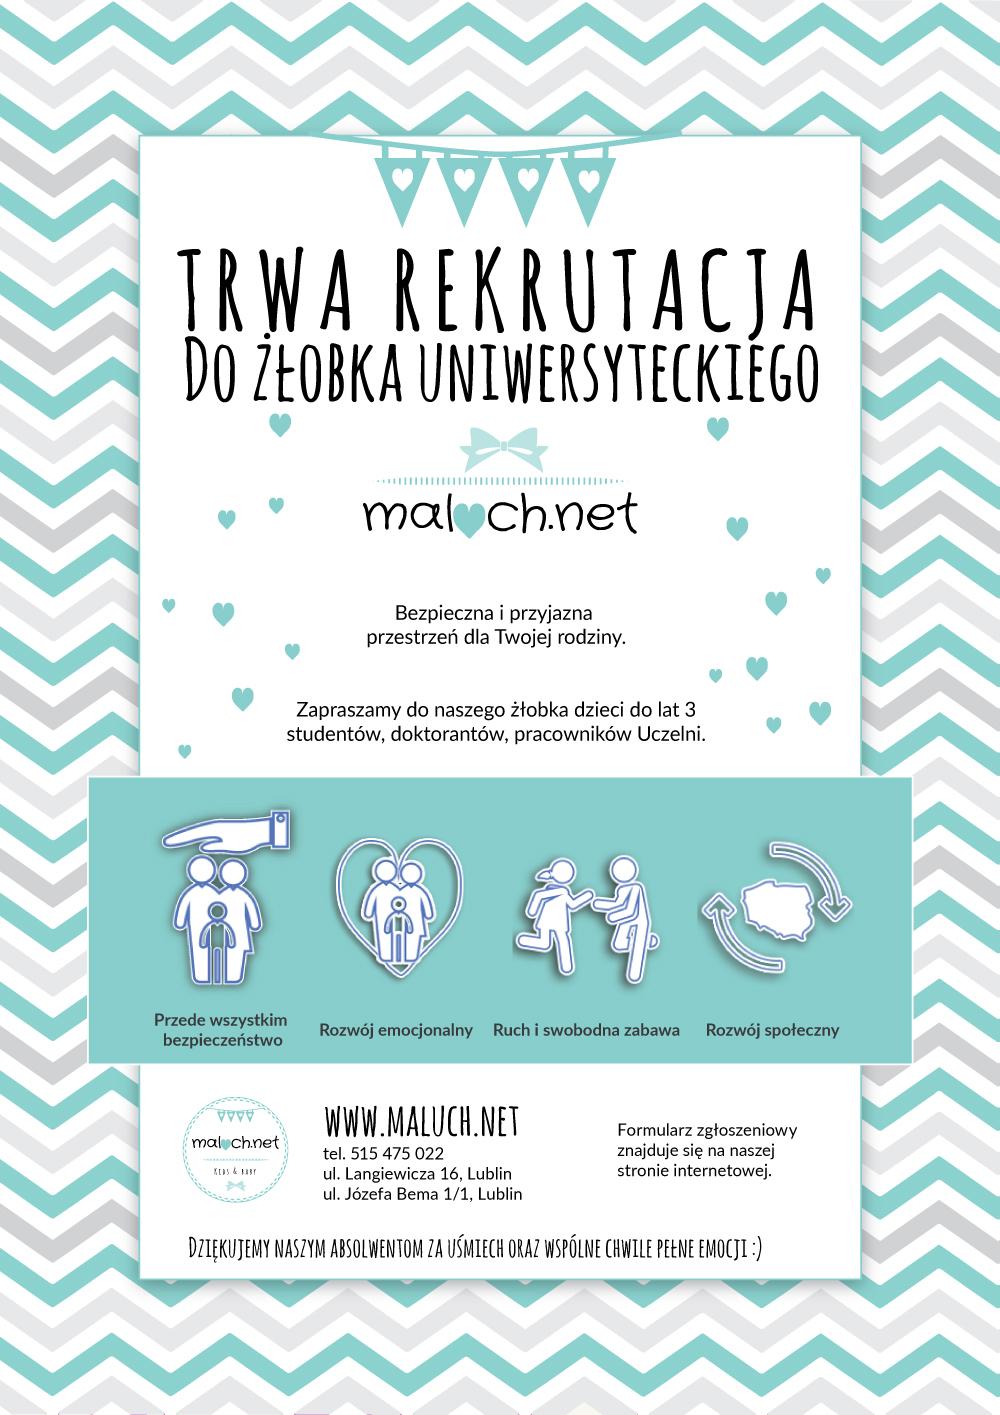 plakat_rekrutacja do Żłobka.jpg